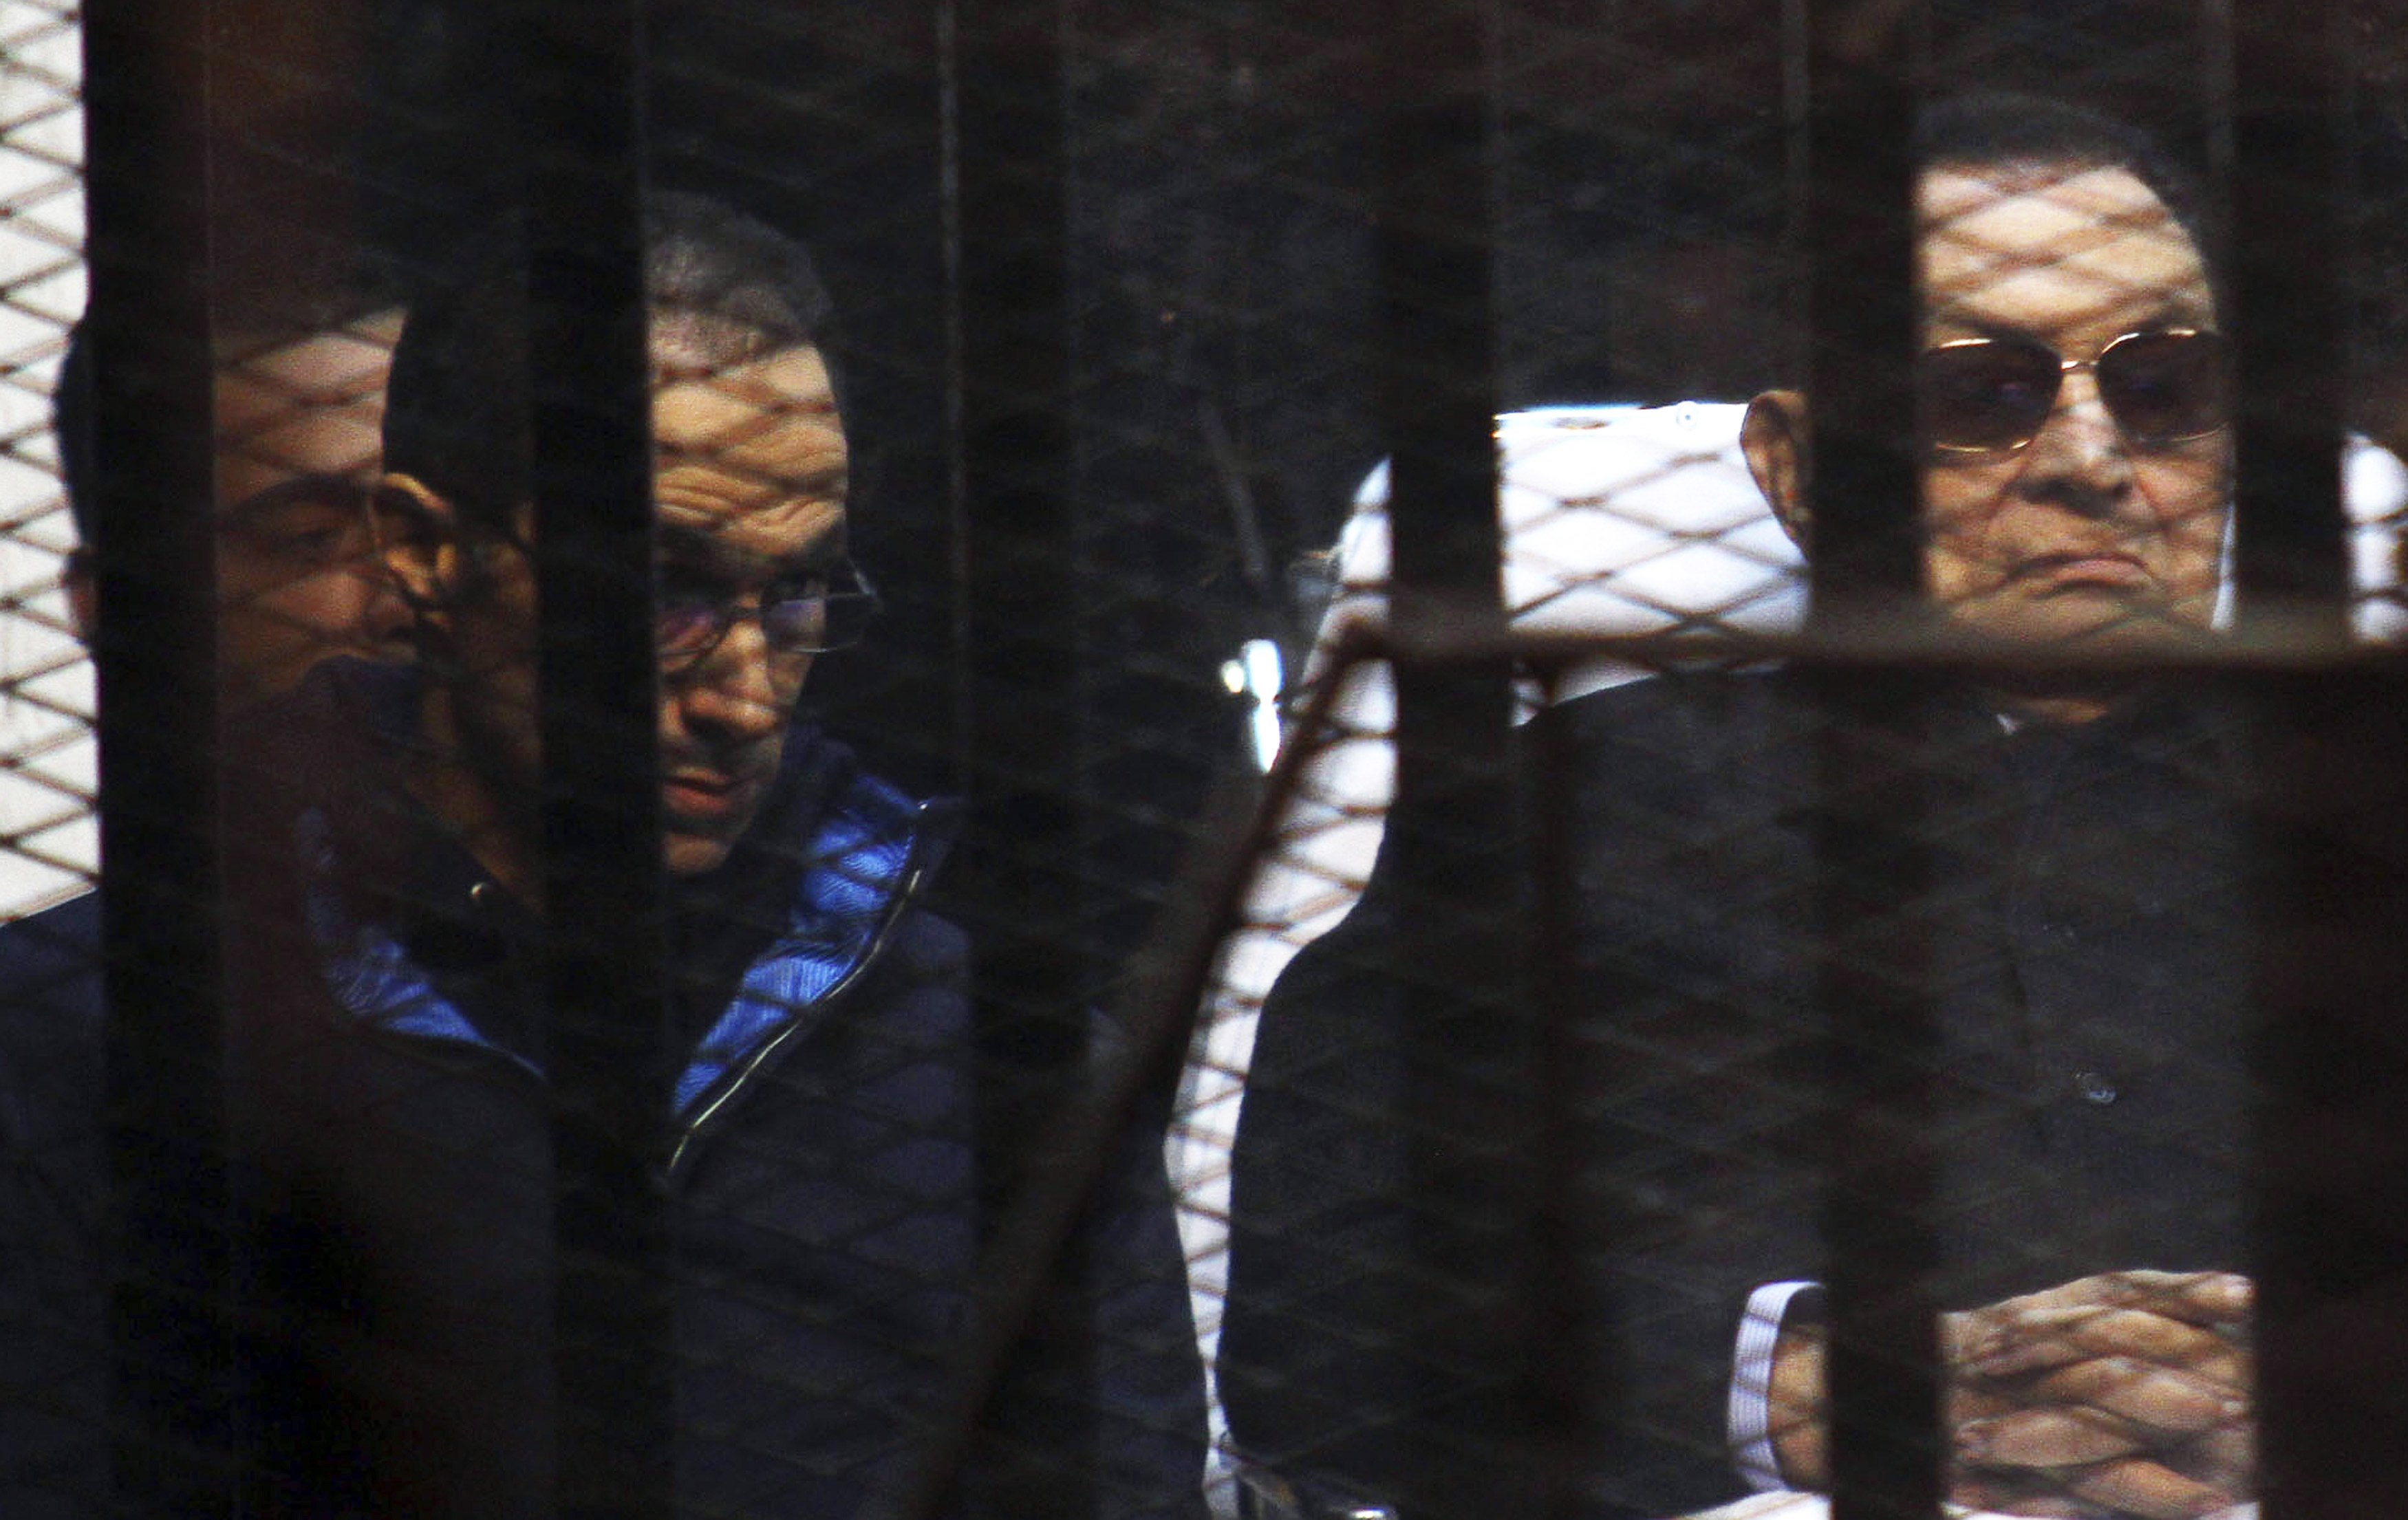 Court orders release of Mubarak's sons, Alaa and Gamal